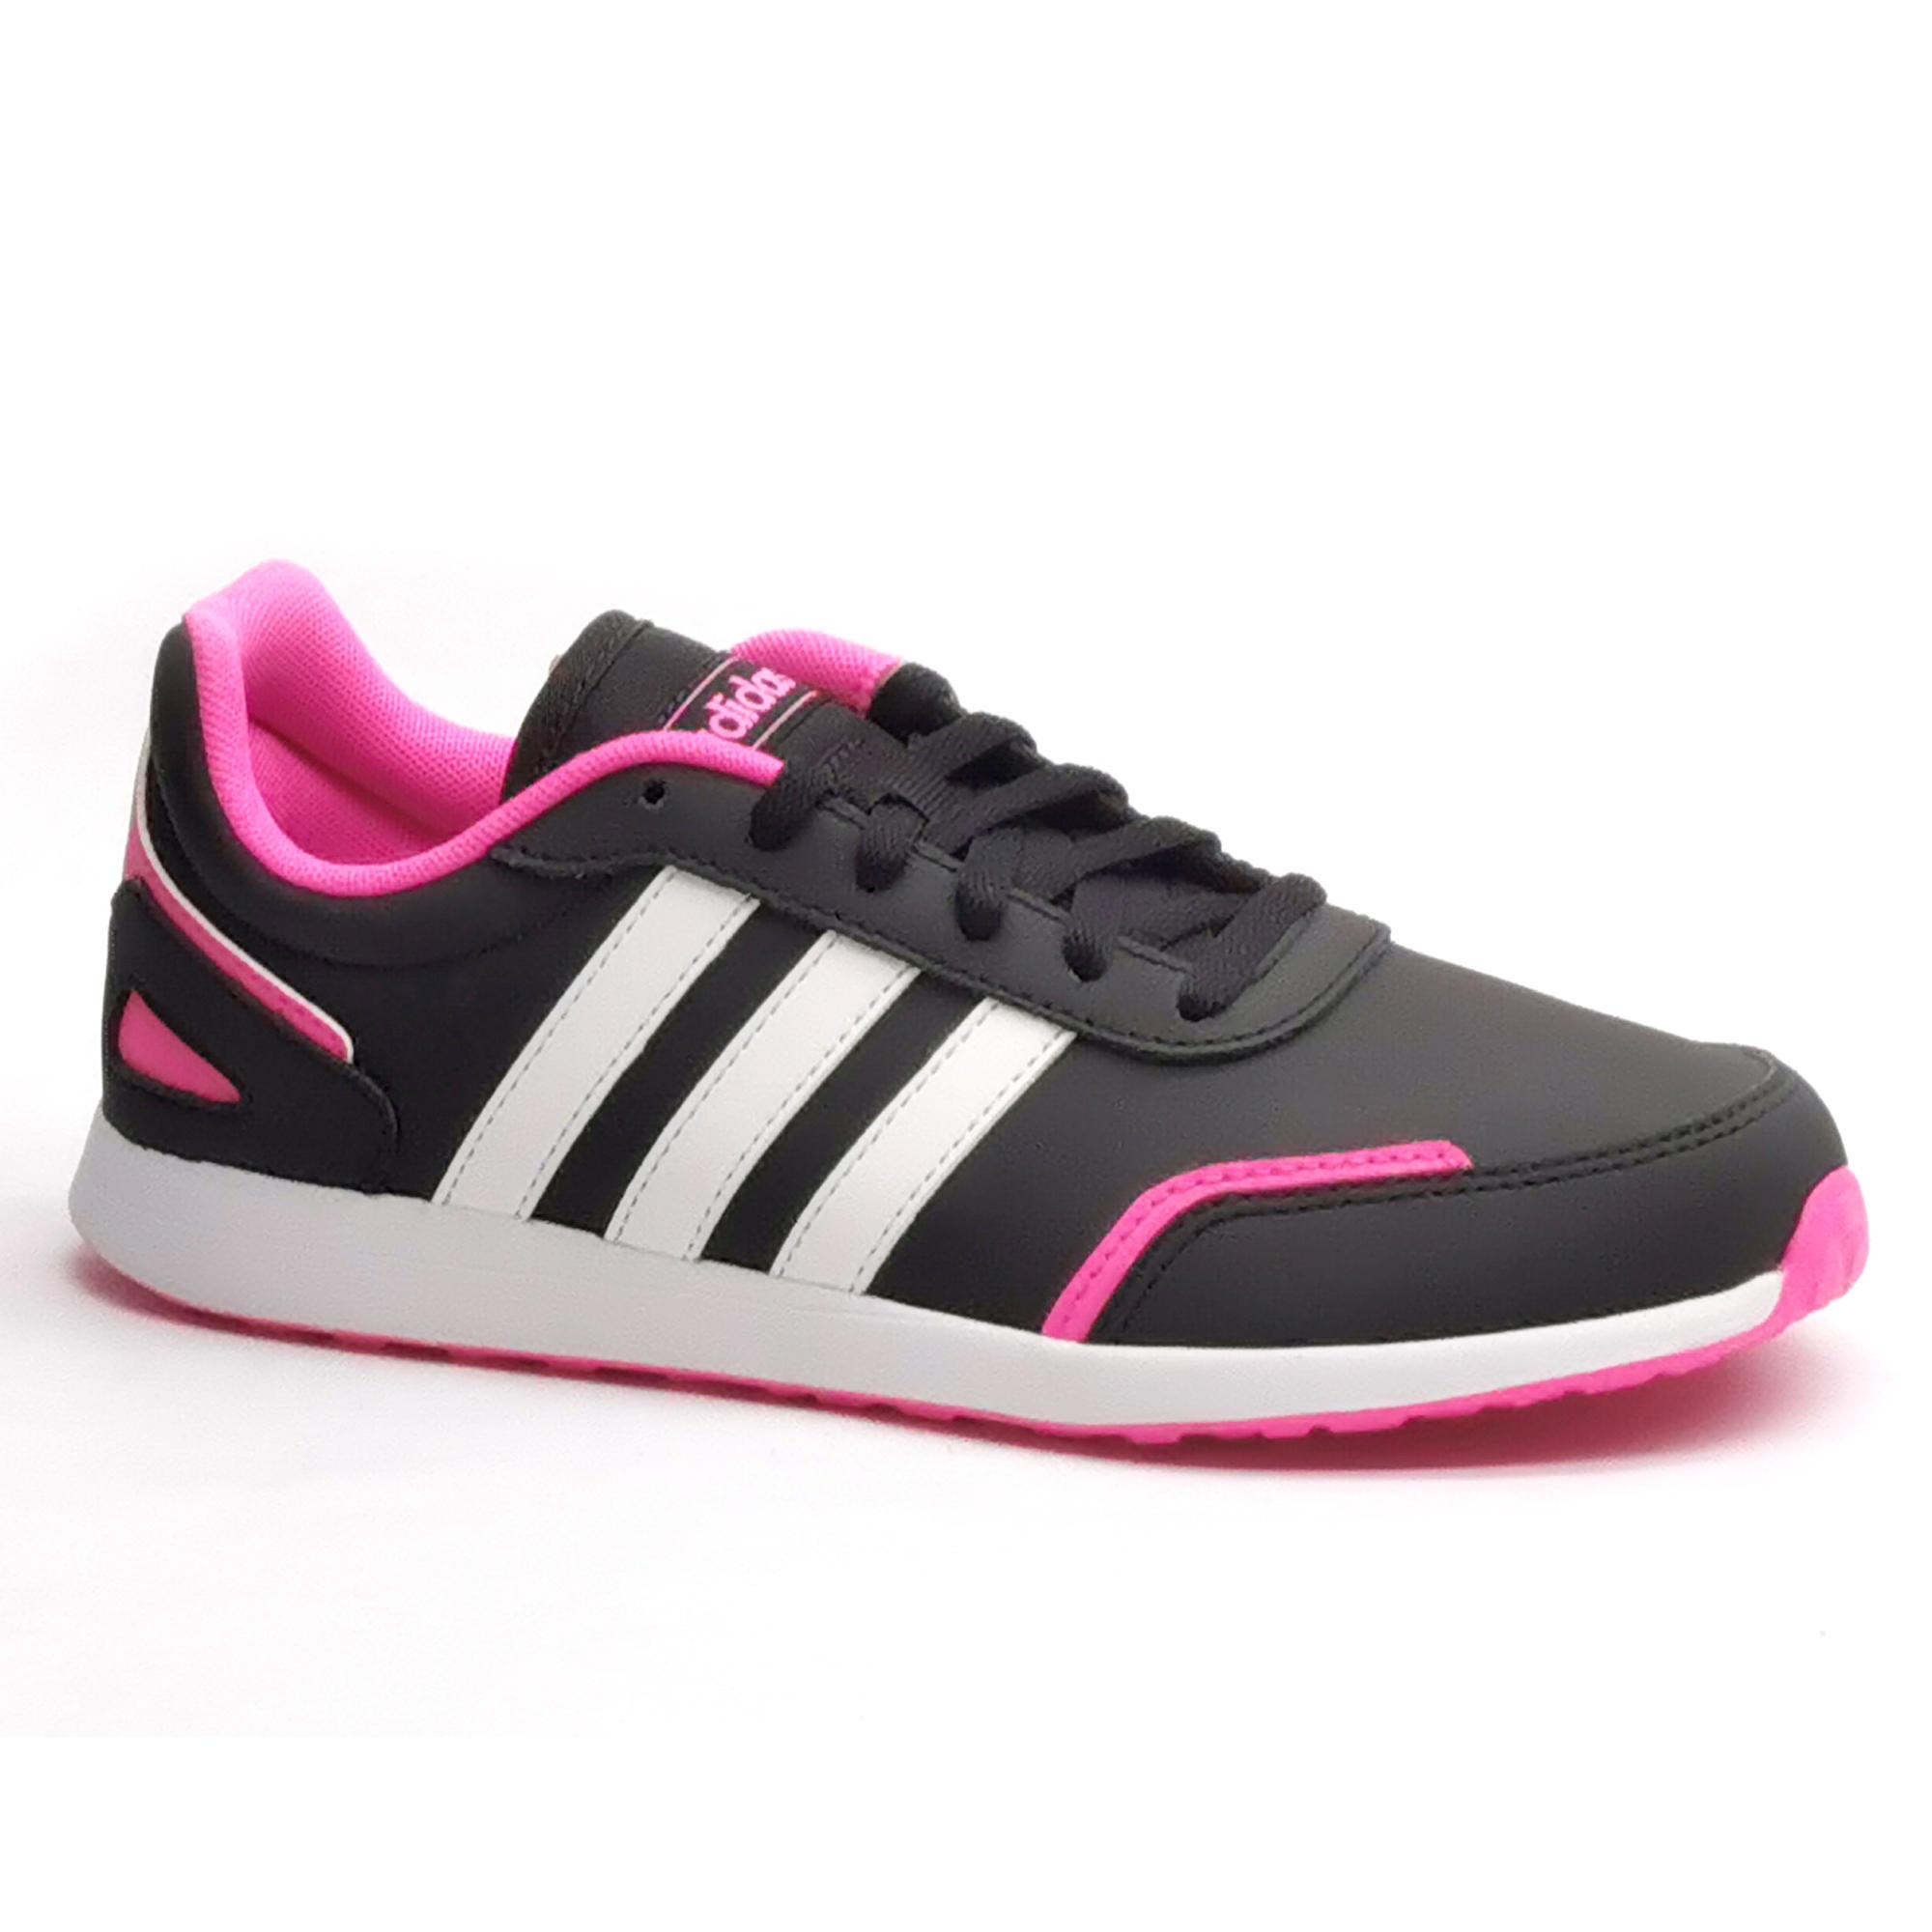 Chaussures enfant Adidas   Decathlon